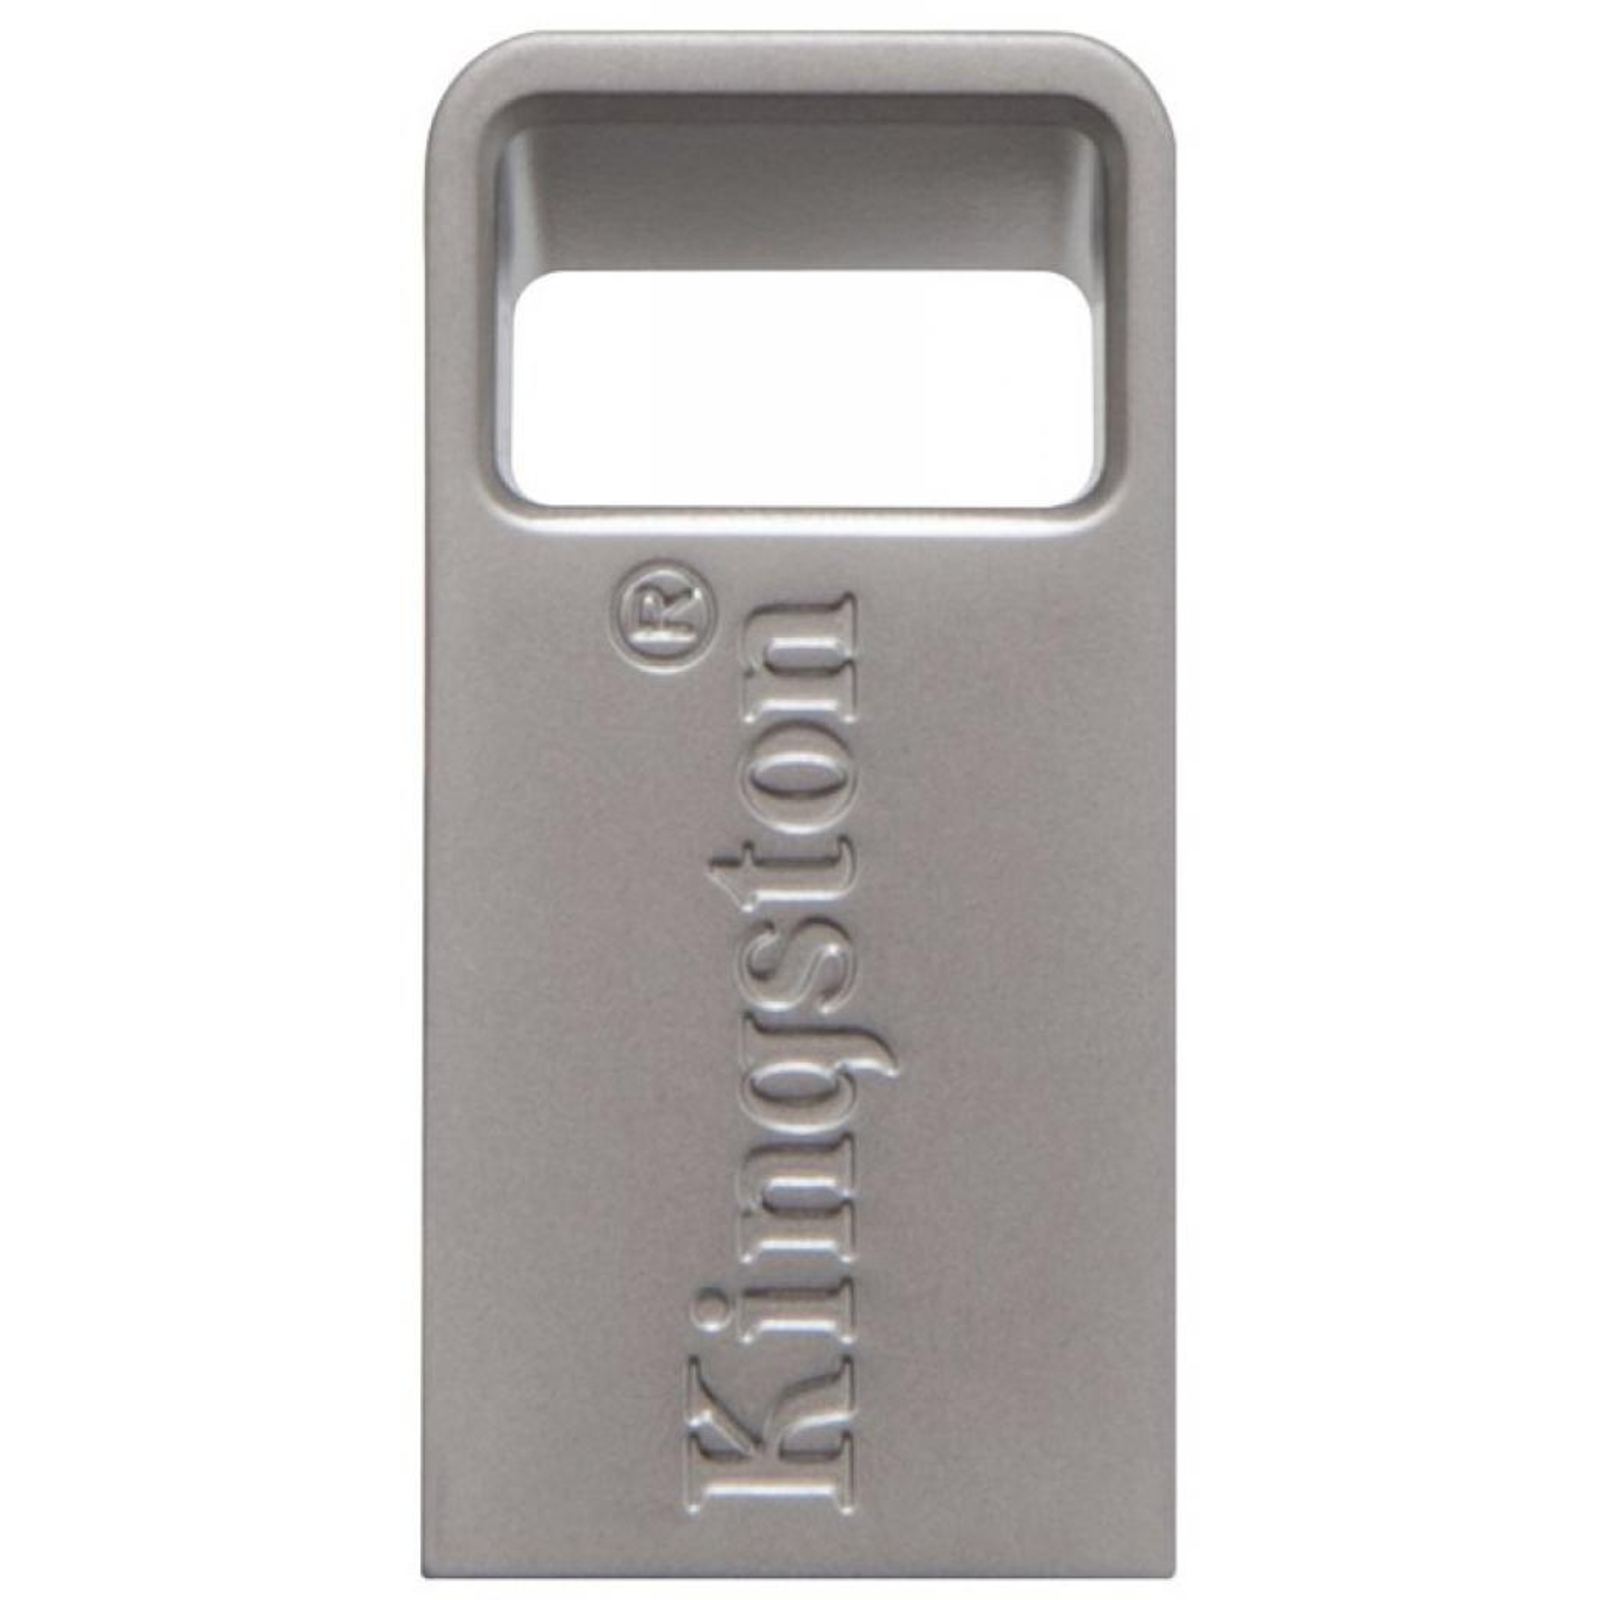 USB флеш накопитель Kingston 128GB DT Micro 3.1 USB 3.1 (DTMC3/128GB) изображение 3